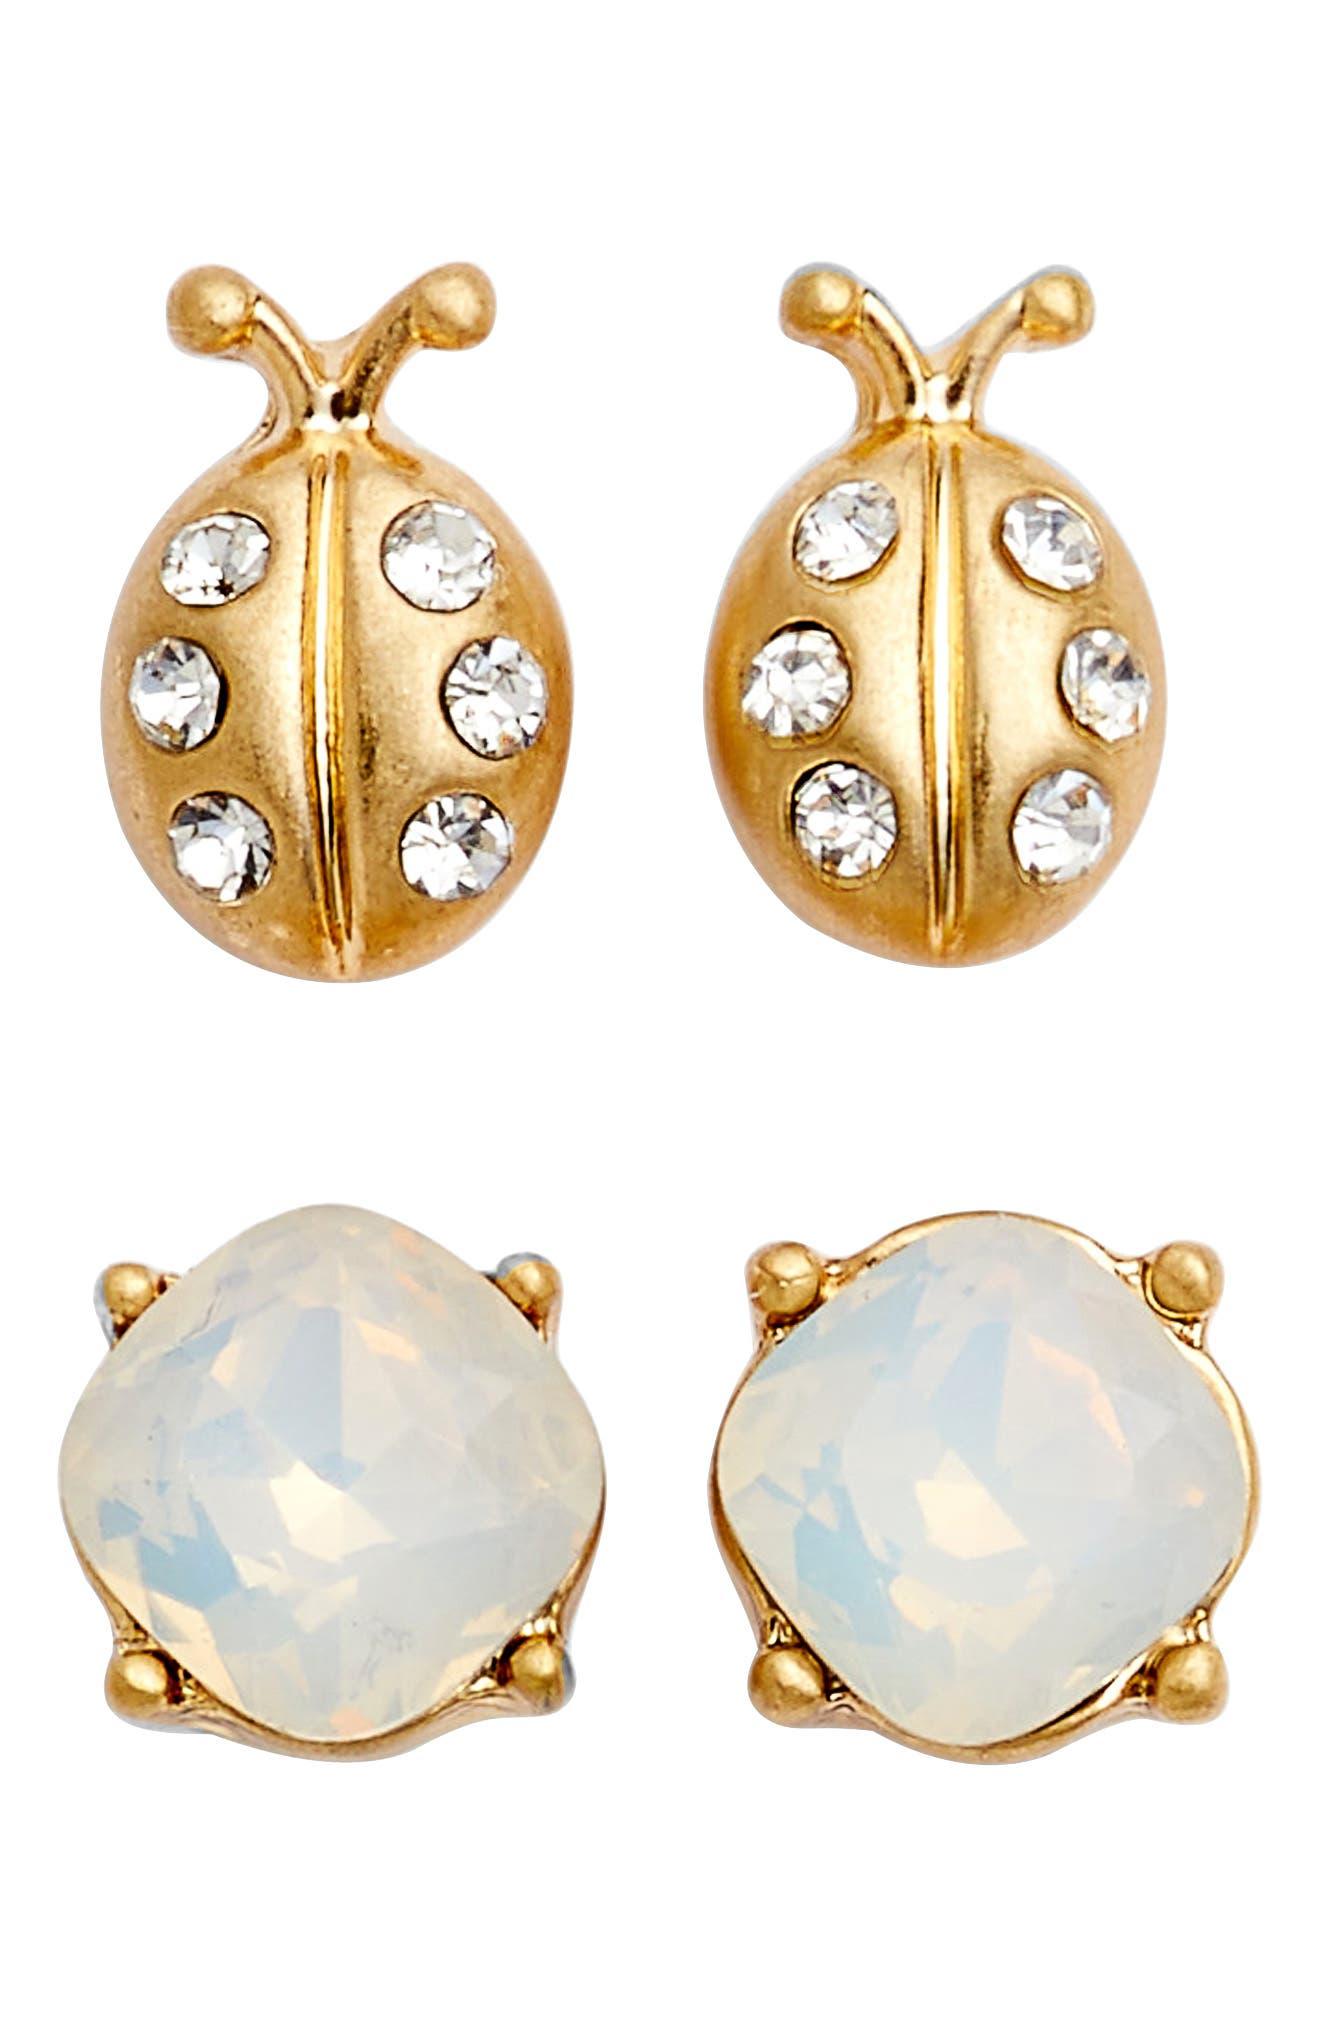 Set of 2 Jeweled Ladybug Earrings,                             Main thumbnail 1, color,                             White Opal- Gold